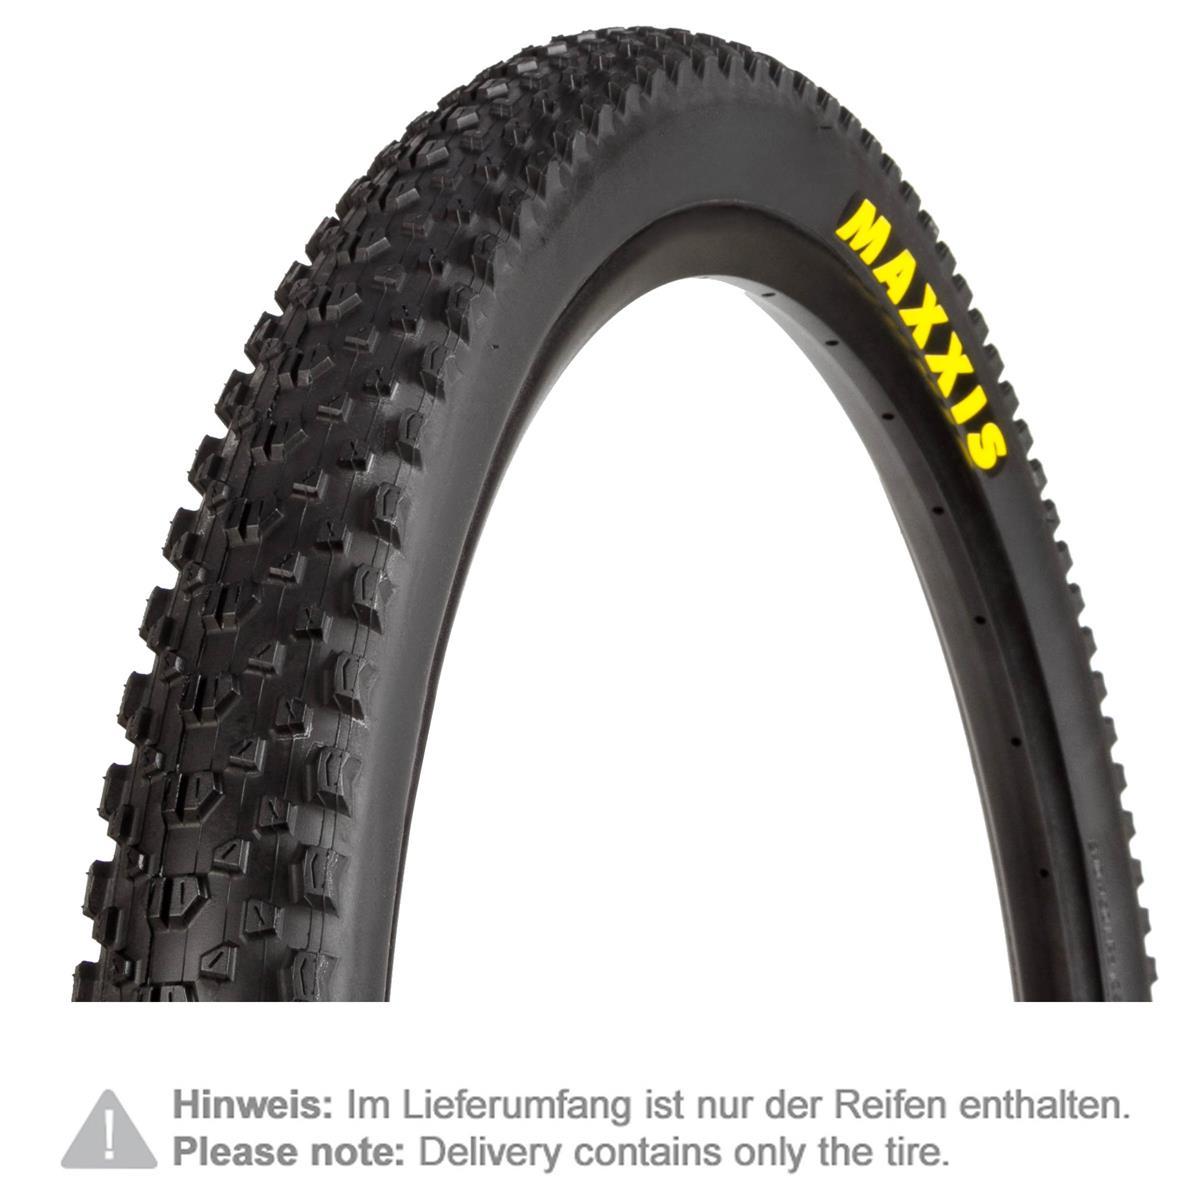 Maxxis MTB-Reifen Ikon Schwarz, 29 x 2.35 Zoll, Tubeless Ready, 3C MaxxSpeed, Faltbar